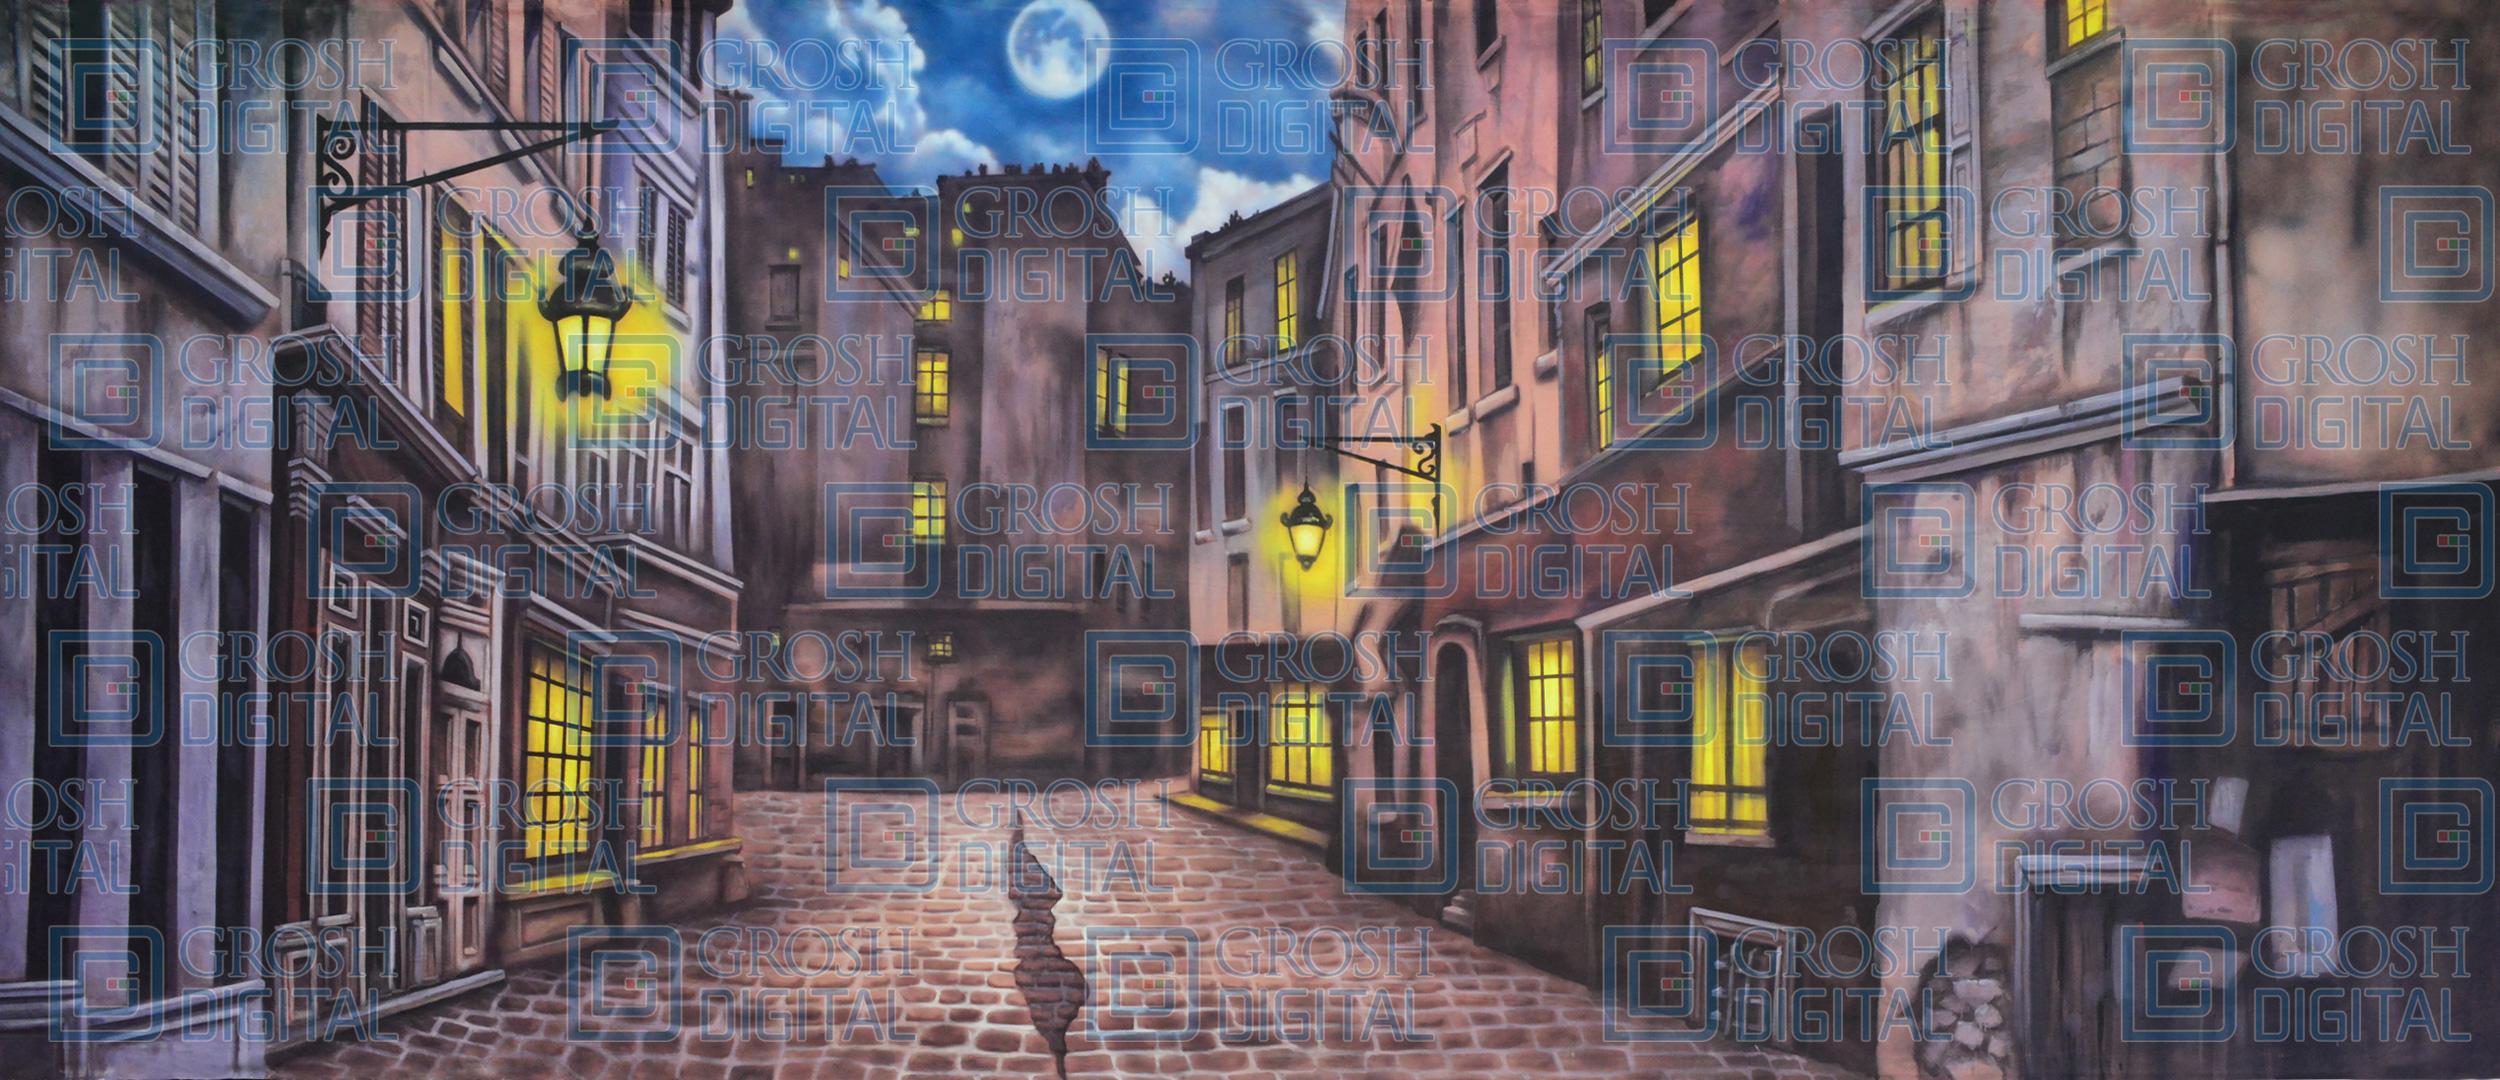 Animated Christmas Wallpaper Windows 7 Free Download European Street Projected Backdrops Grosh Digital